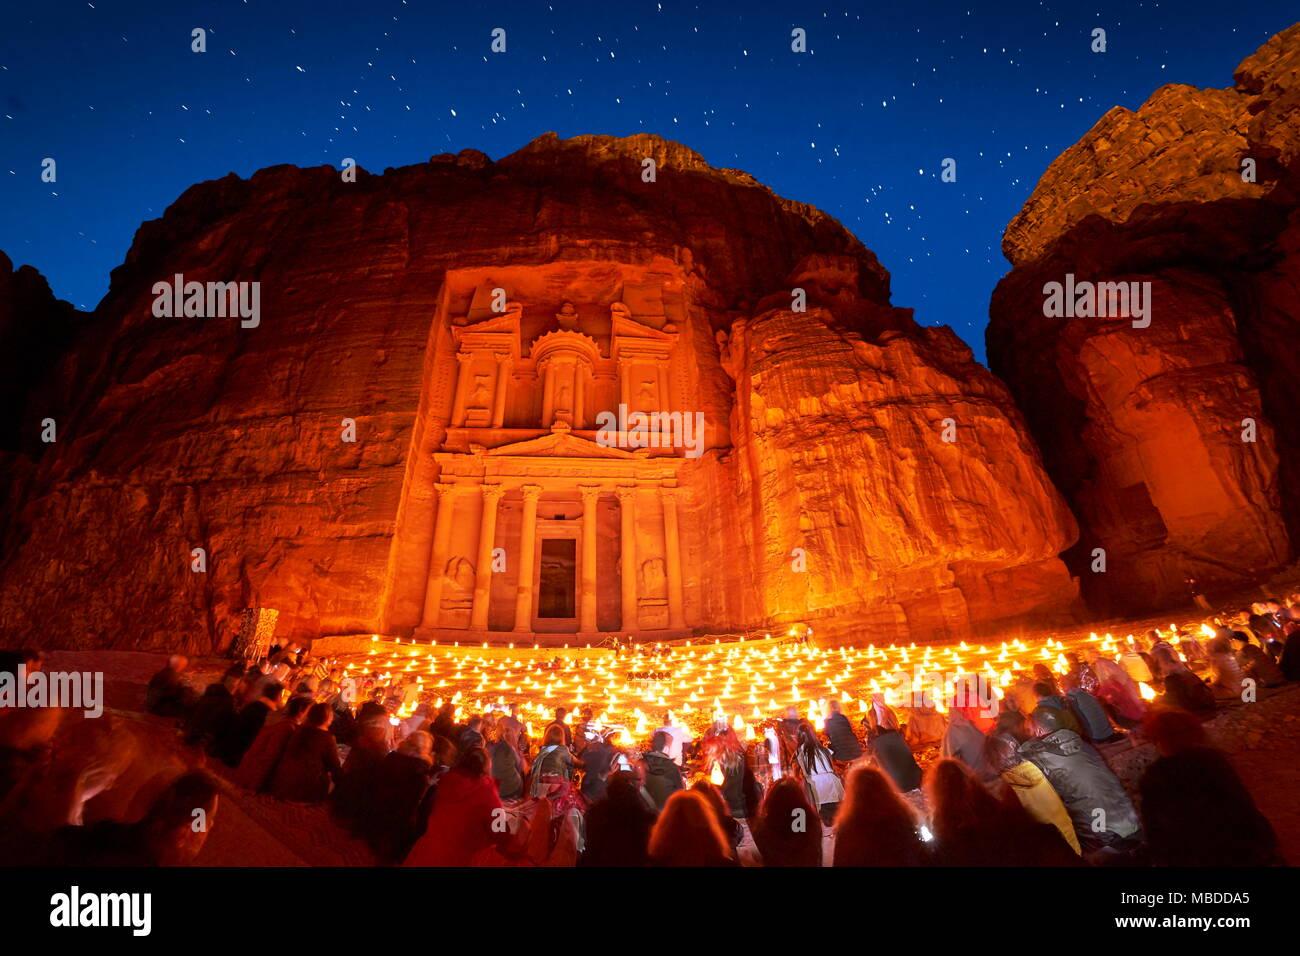 Petra por la noche, el Tesoro Al Khazneh, Petra, Jordania Imagen De Stock